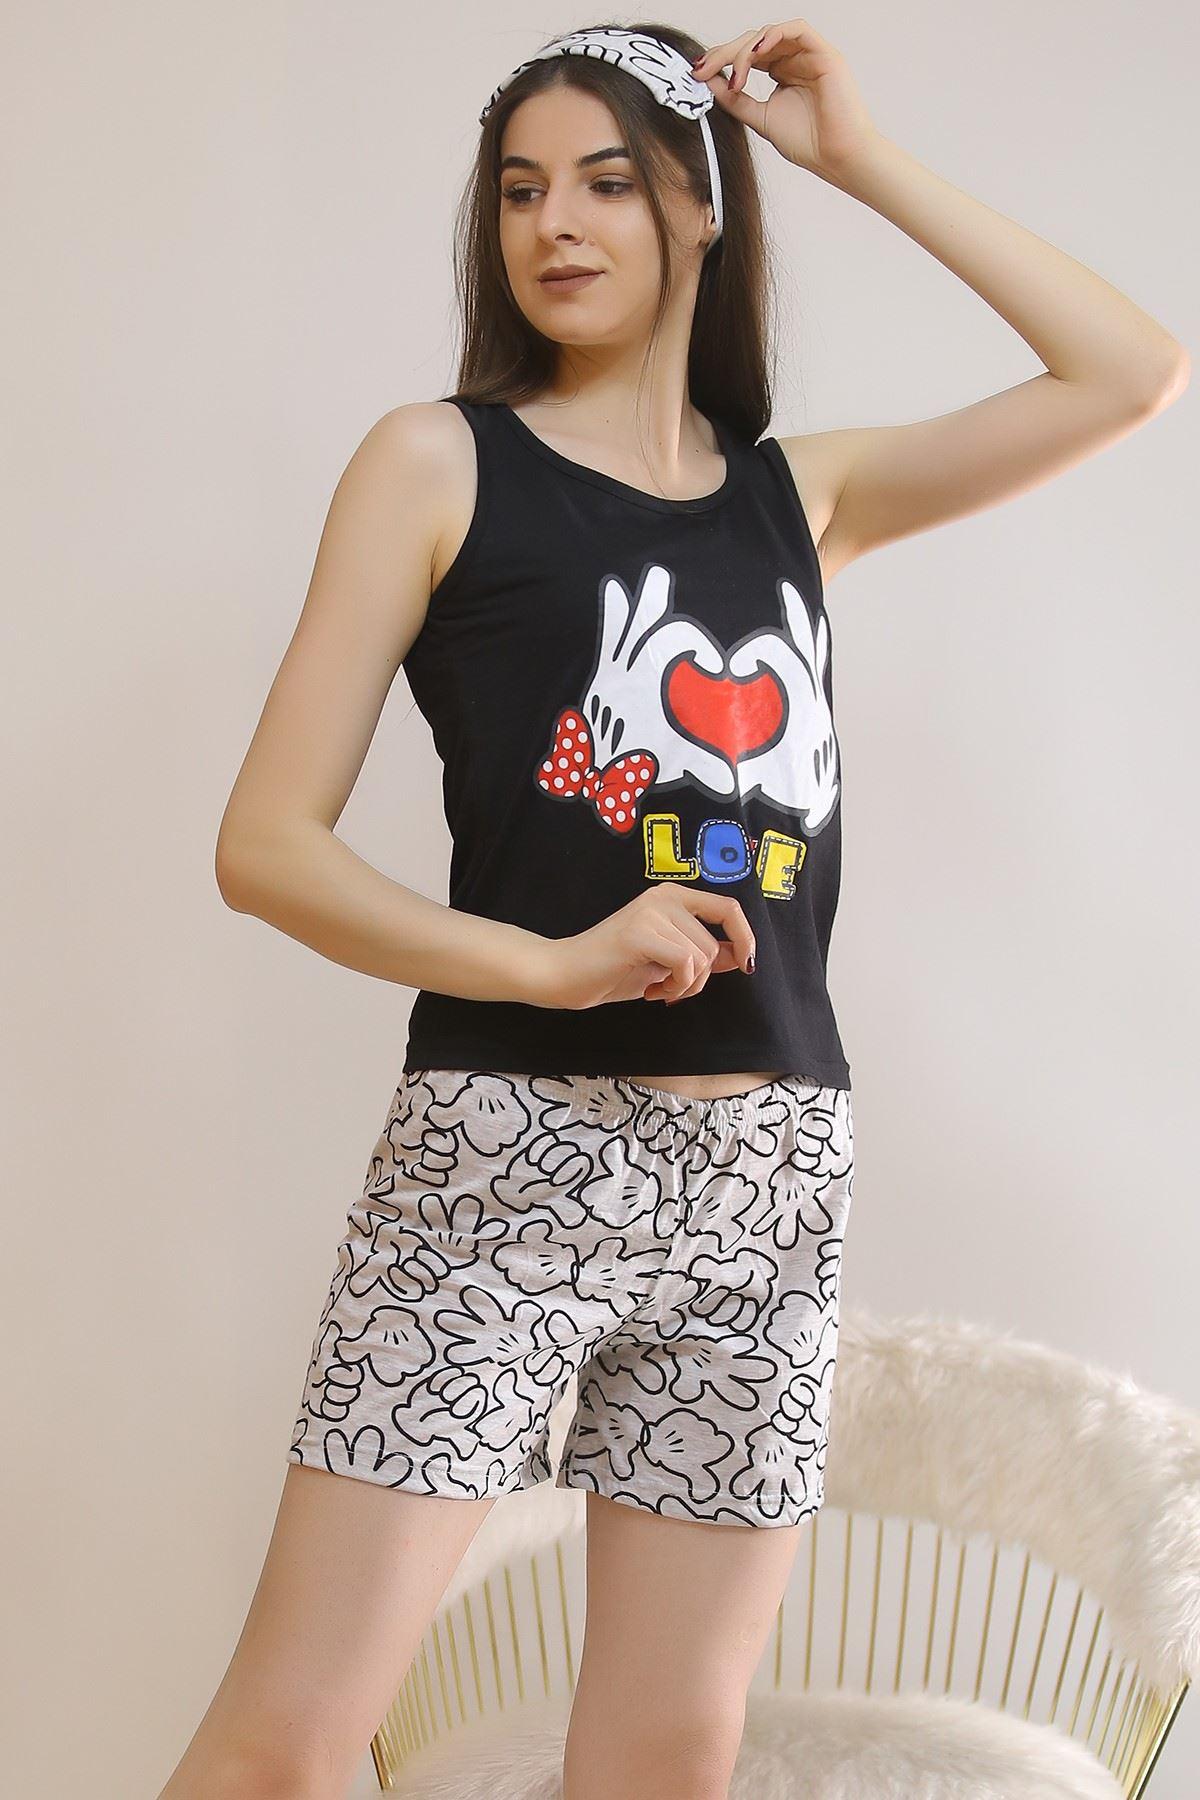 Şortlu Pijama Takımı Siyah - 5930.1059.